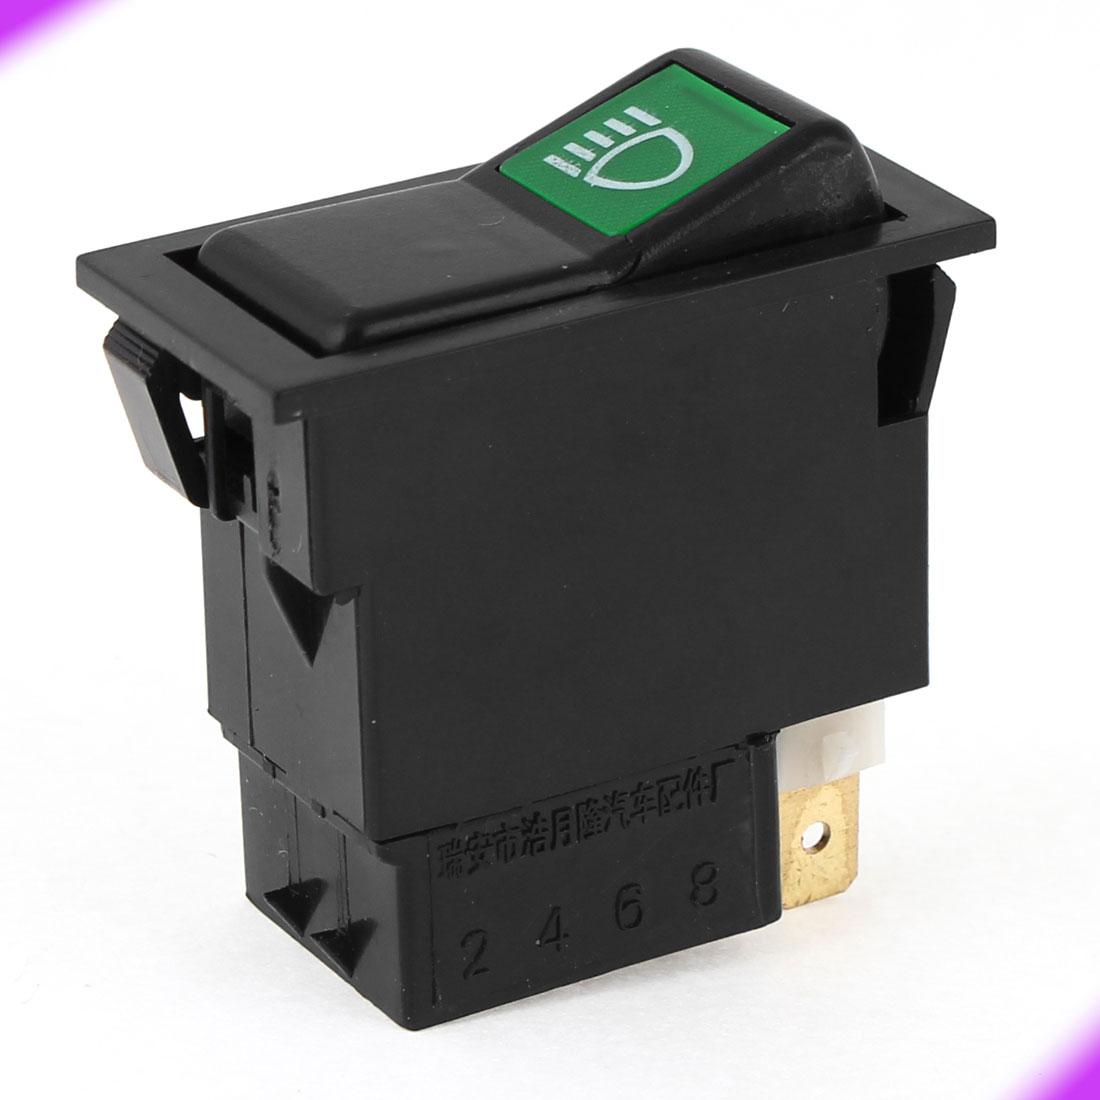 HTB1iBwEJVXXXXcMXFXXq6xXFXXXQ cheap accord fog light switch, find accord fog light switch deals on